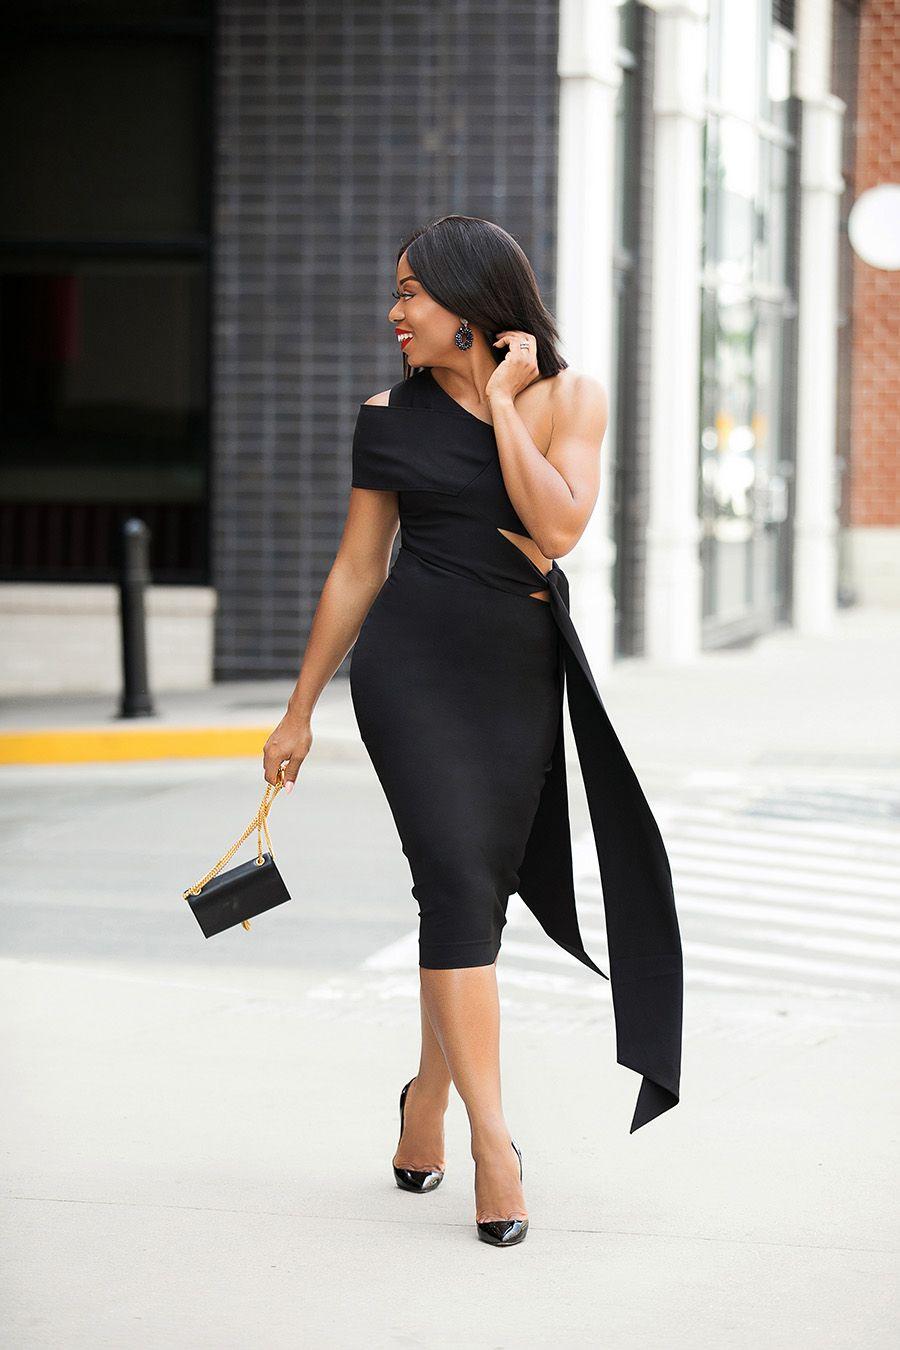 How to wear black to summer wedding juadorefashion big girl